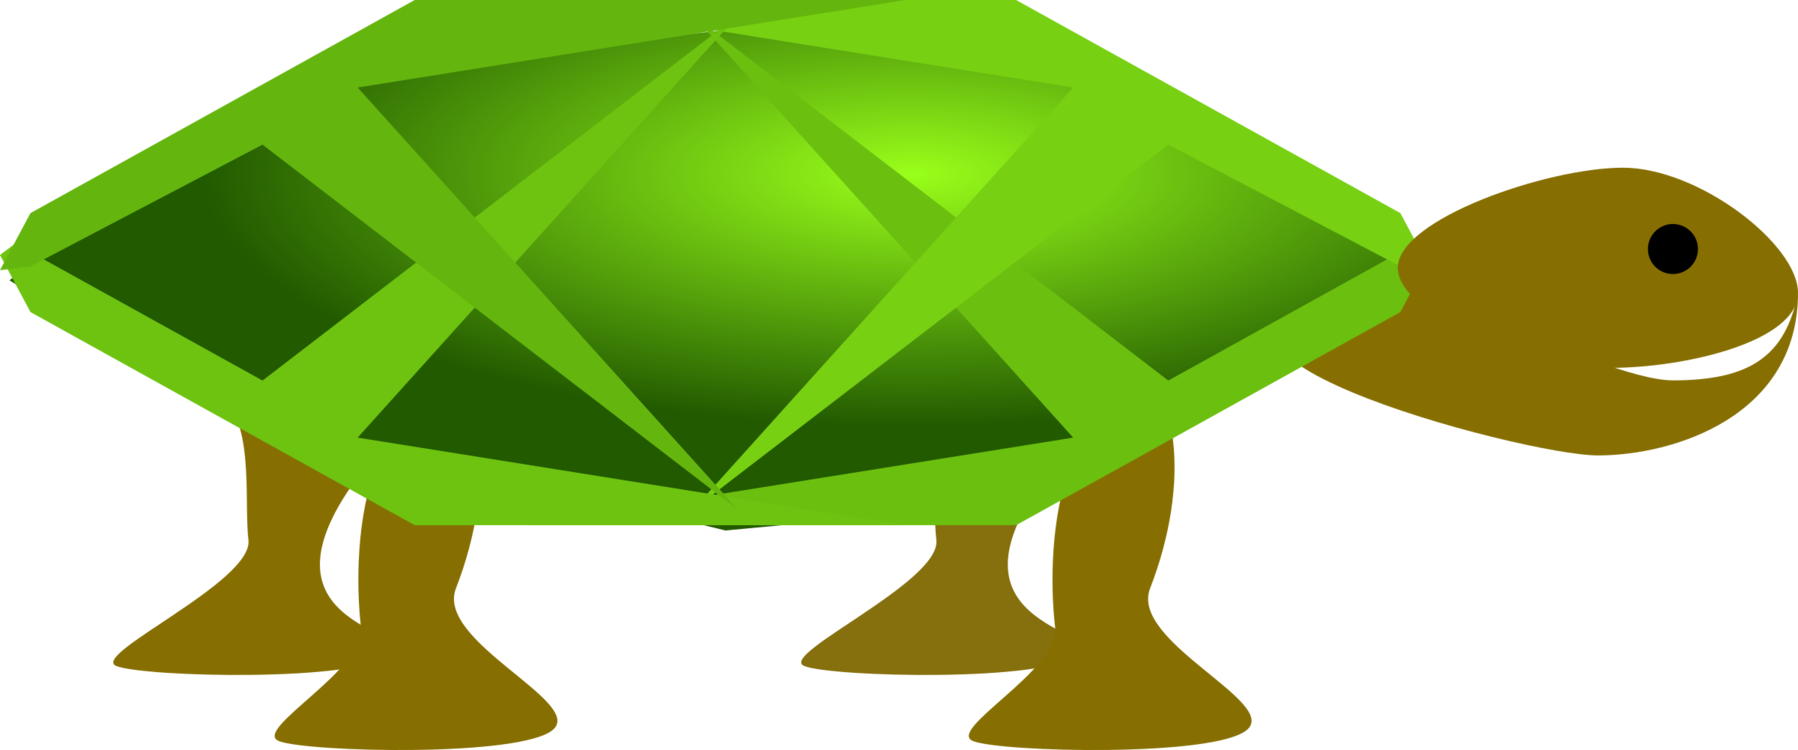 Turtle,Reptile,Leaf